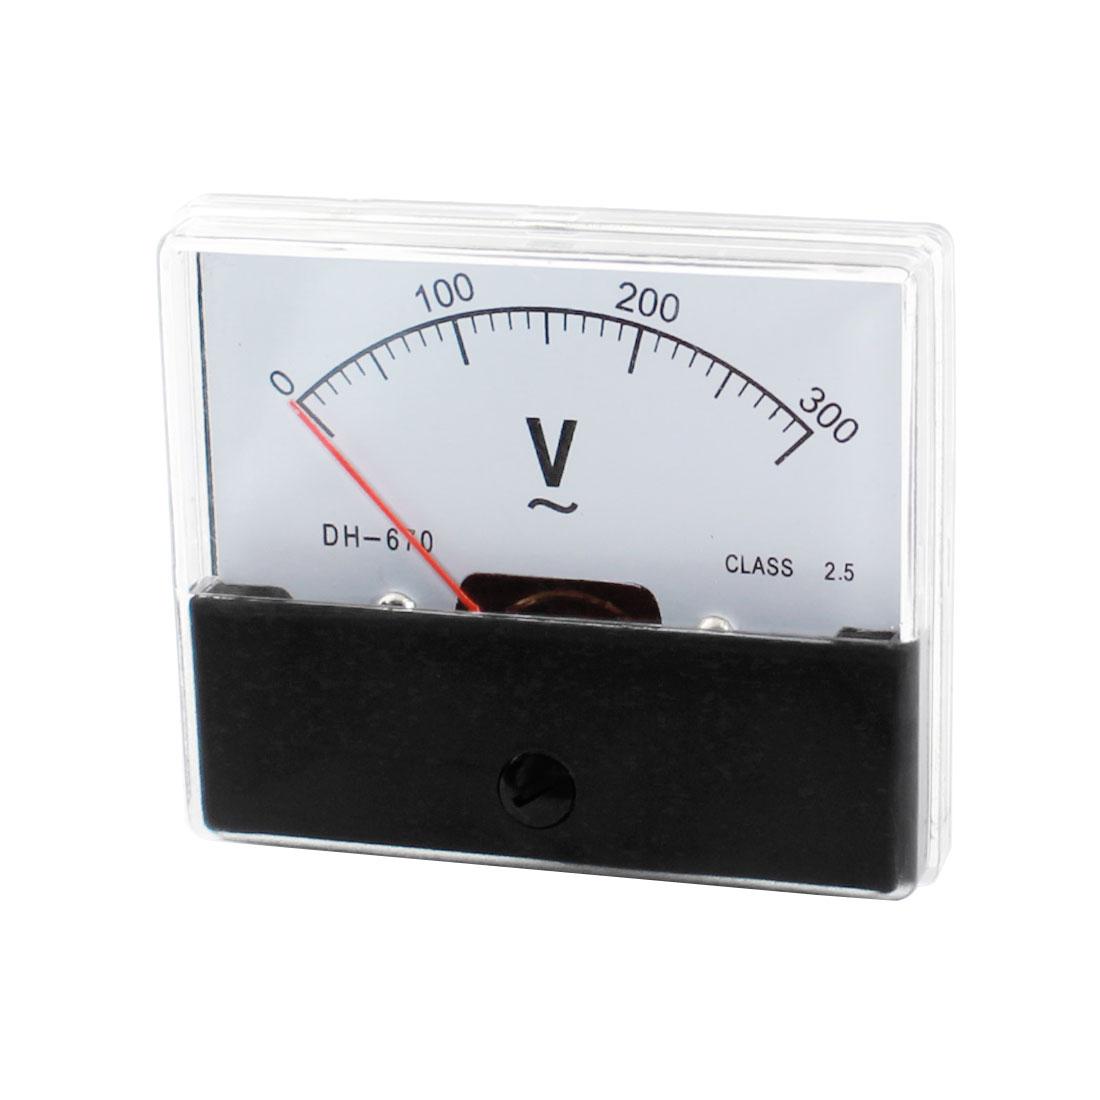 School Lab AC 0-300V Measuring Range Voltage Testing Panel Mount Rectangle Plastic Analog Voltmeter DH-672